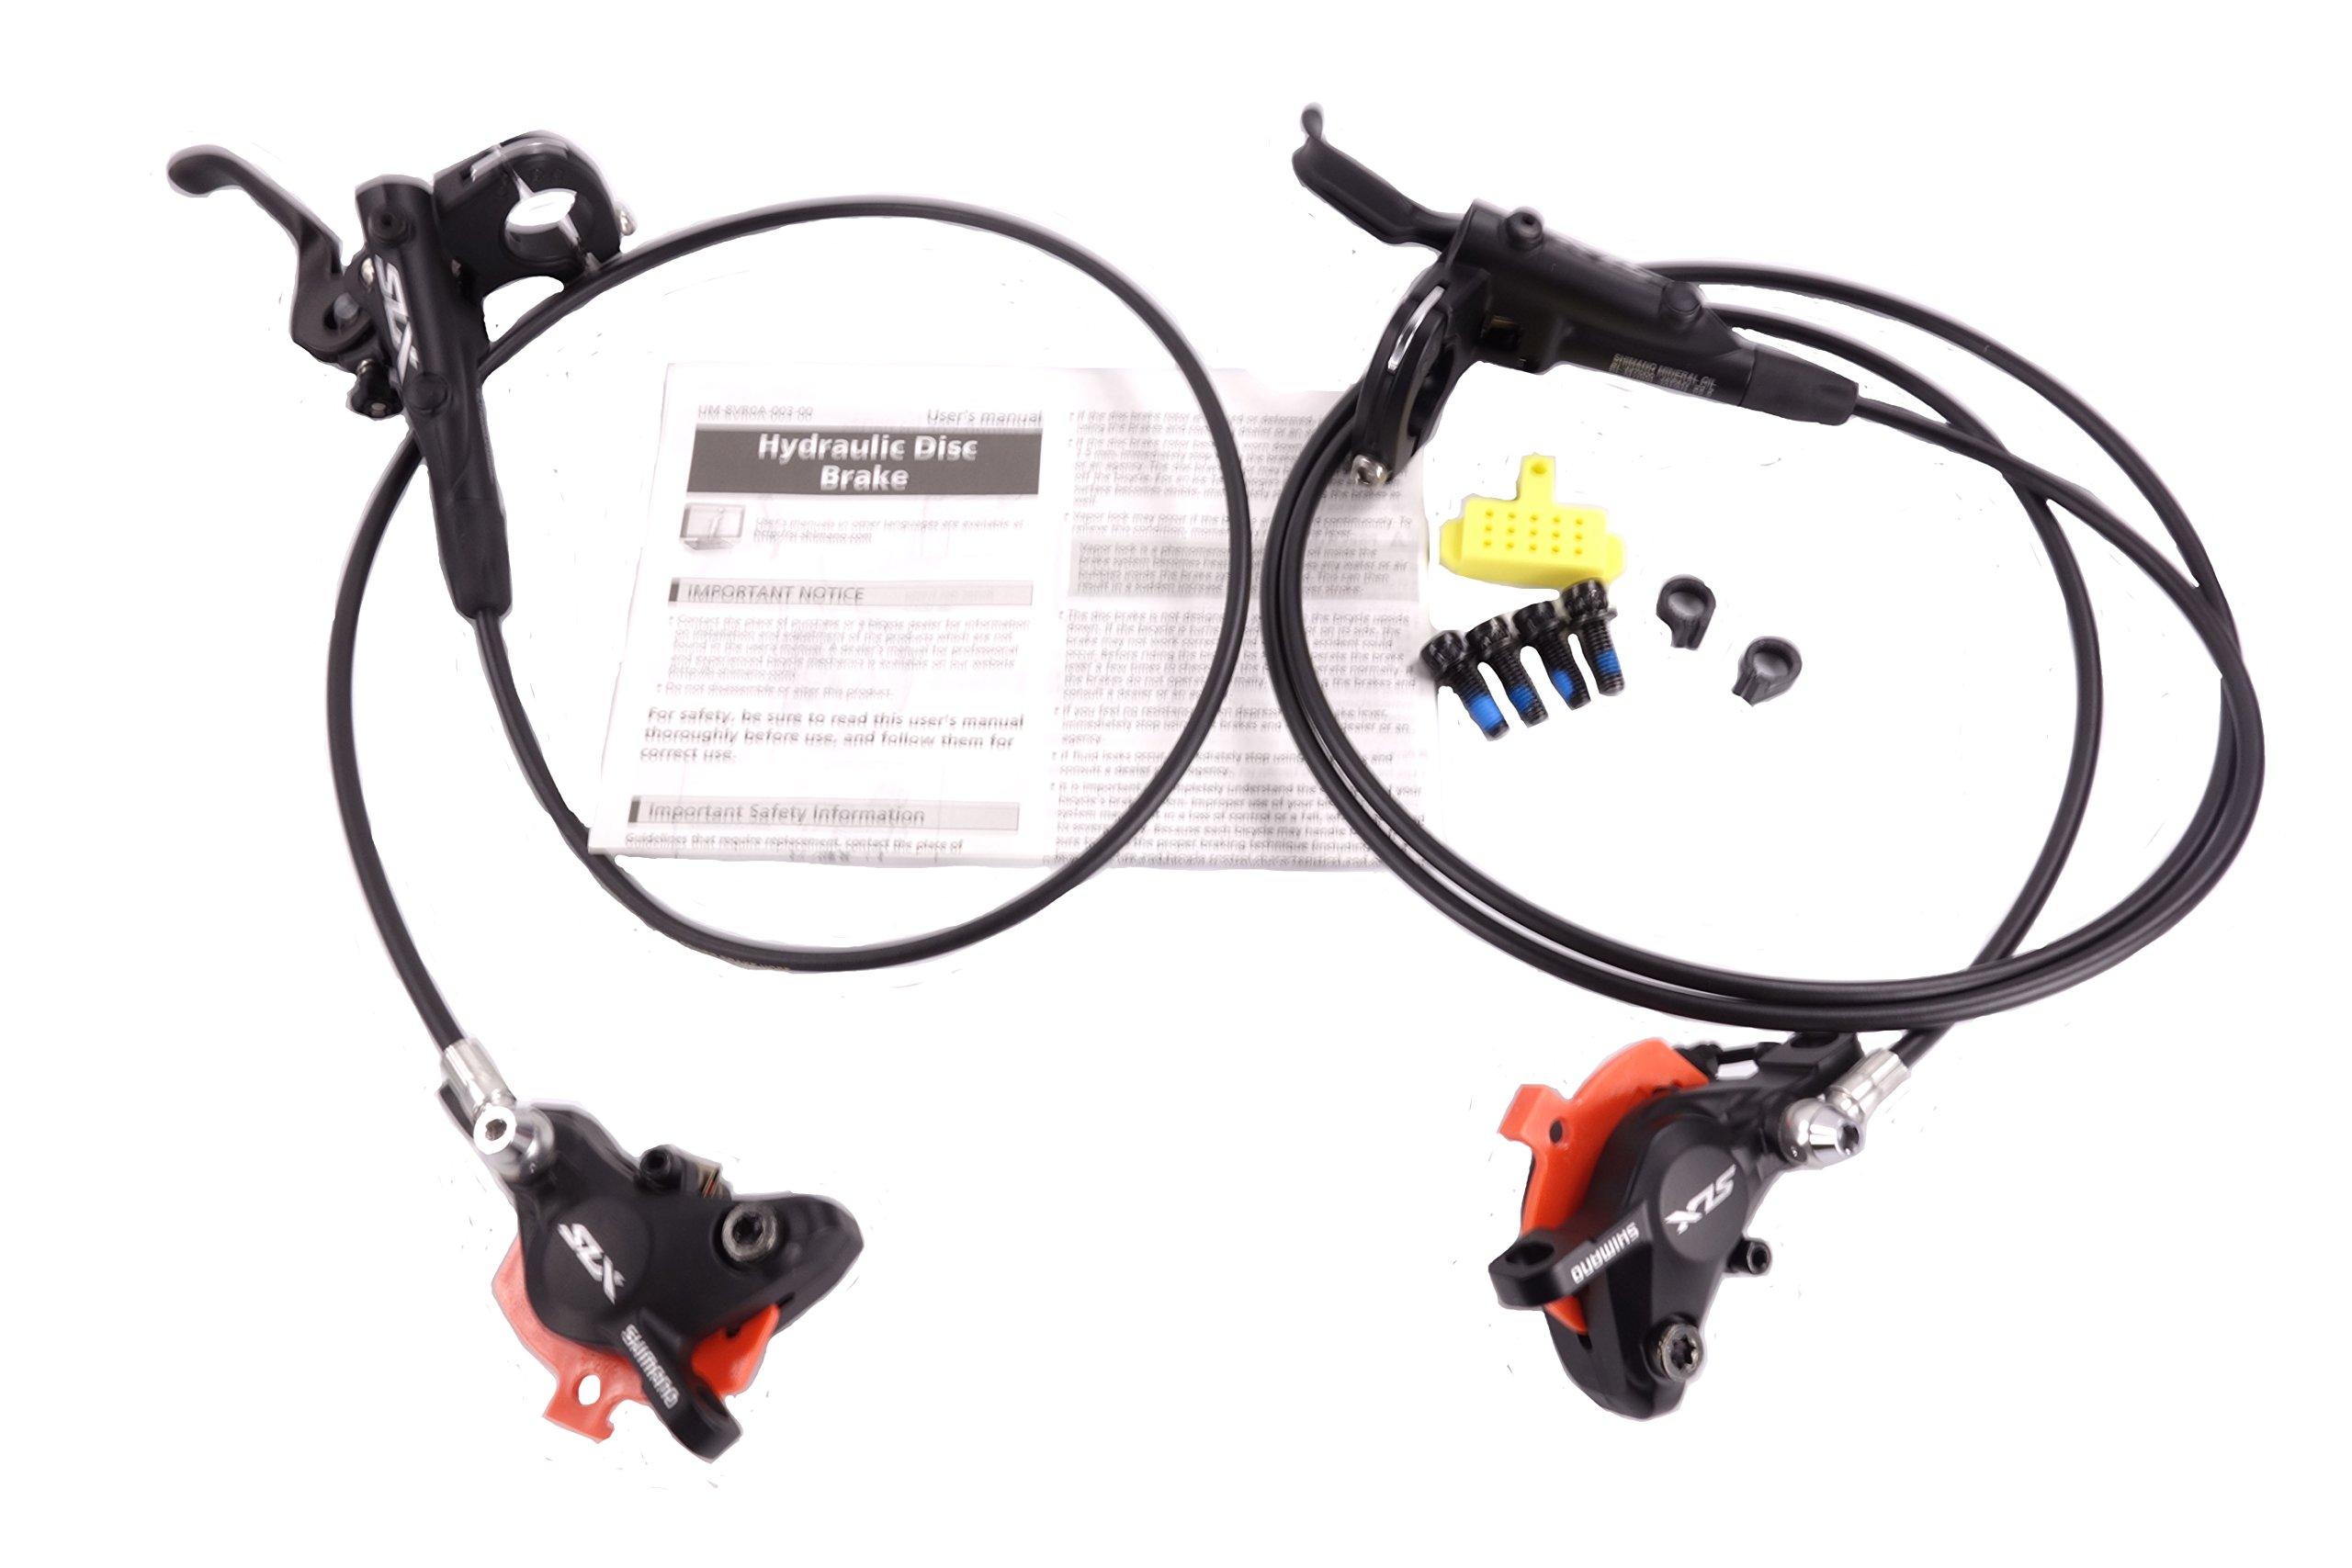 SHIMANO SLX BR-M7000 Hydraulic Brake Kit Set Disc Brake - EU Model